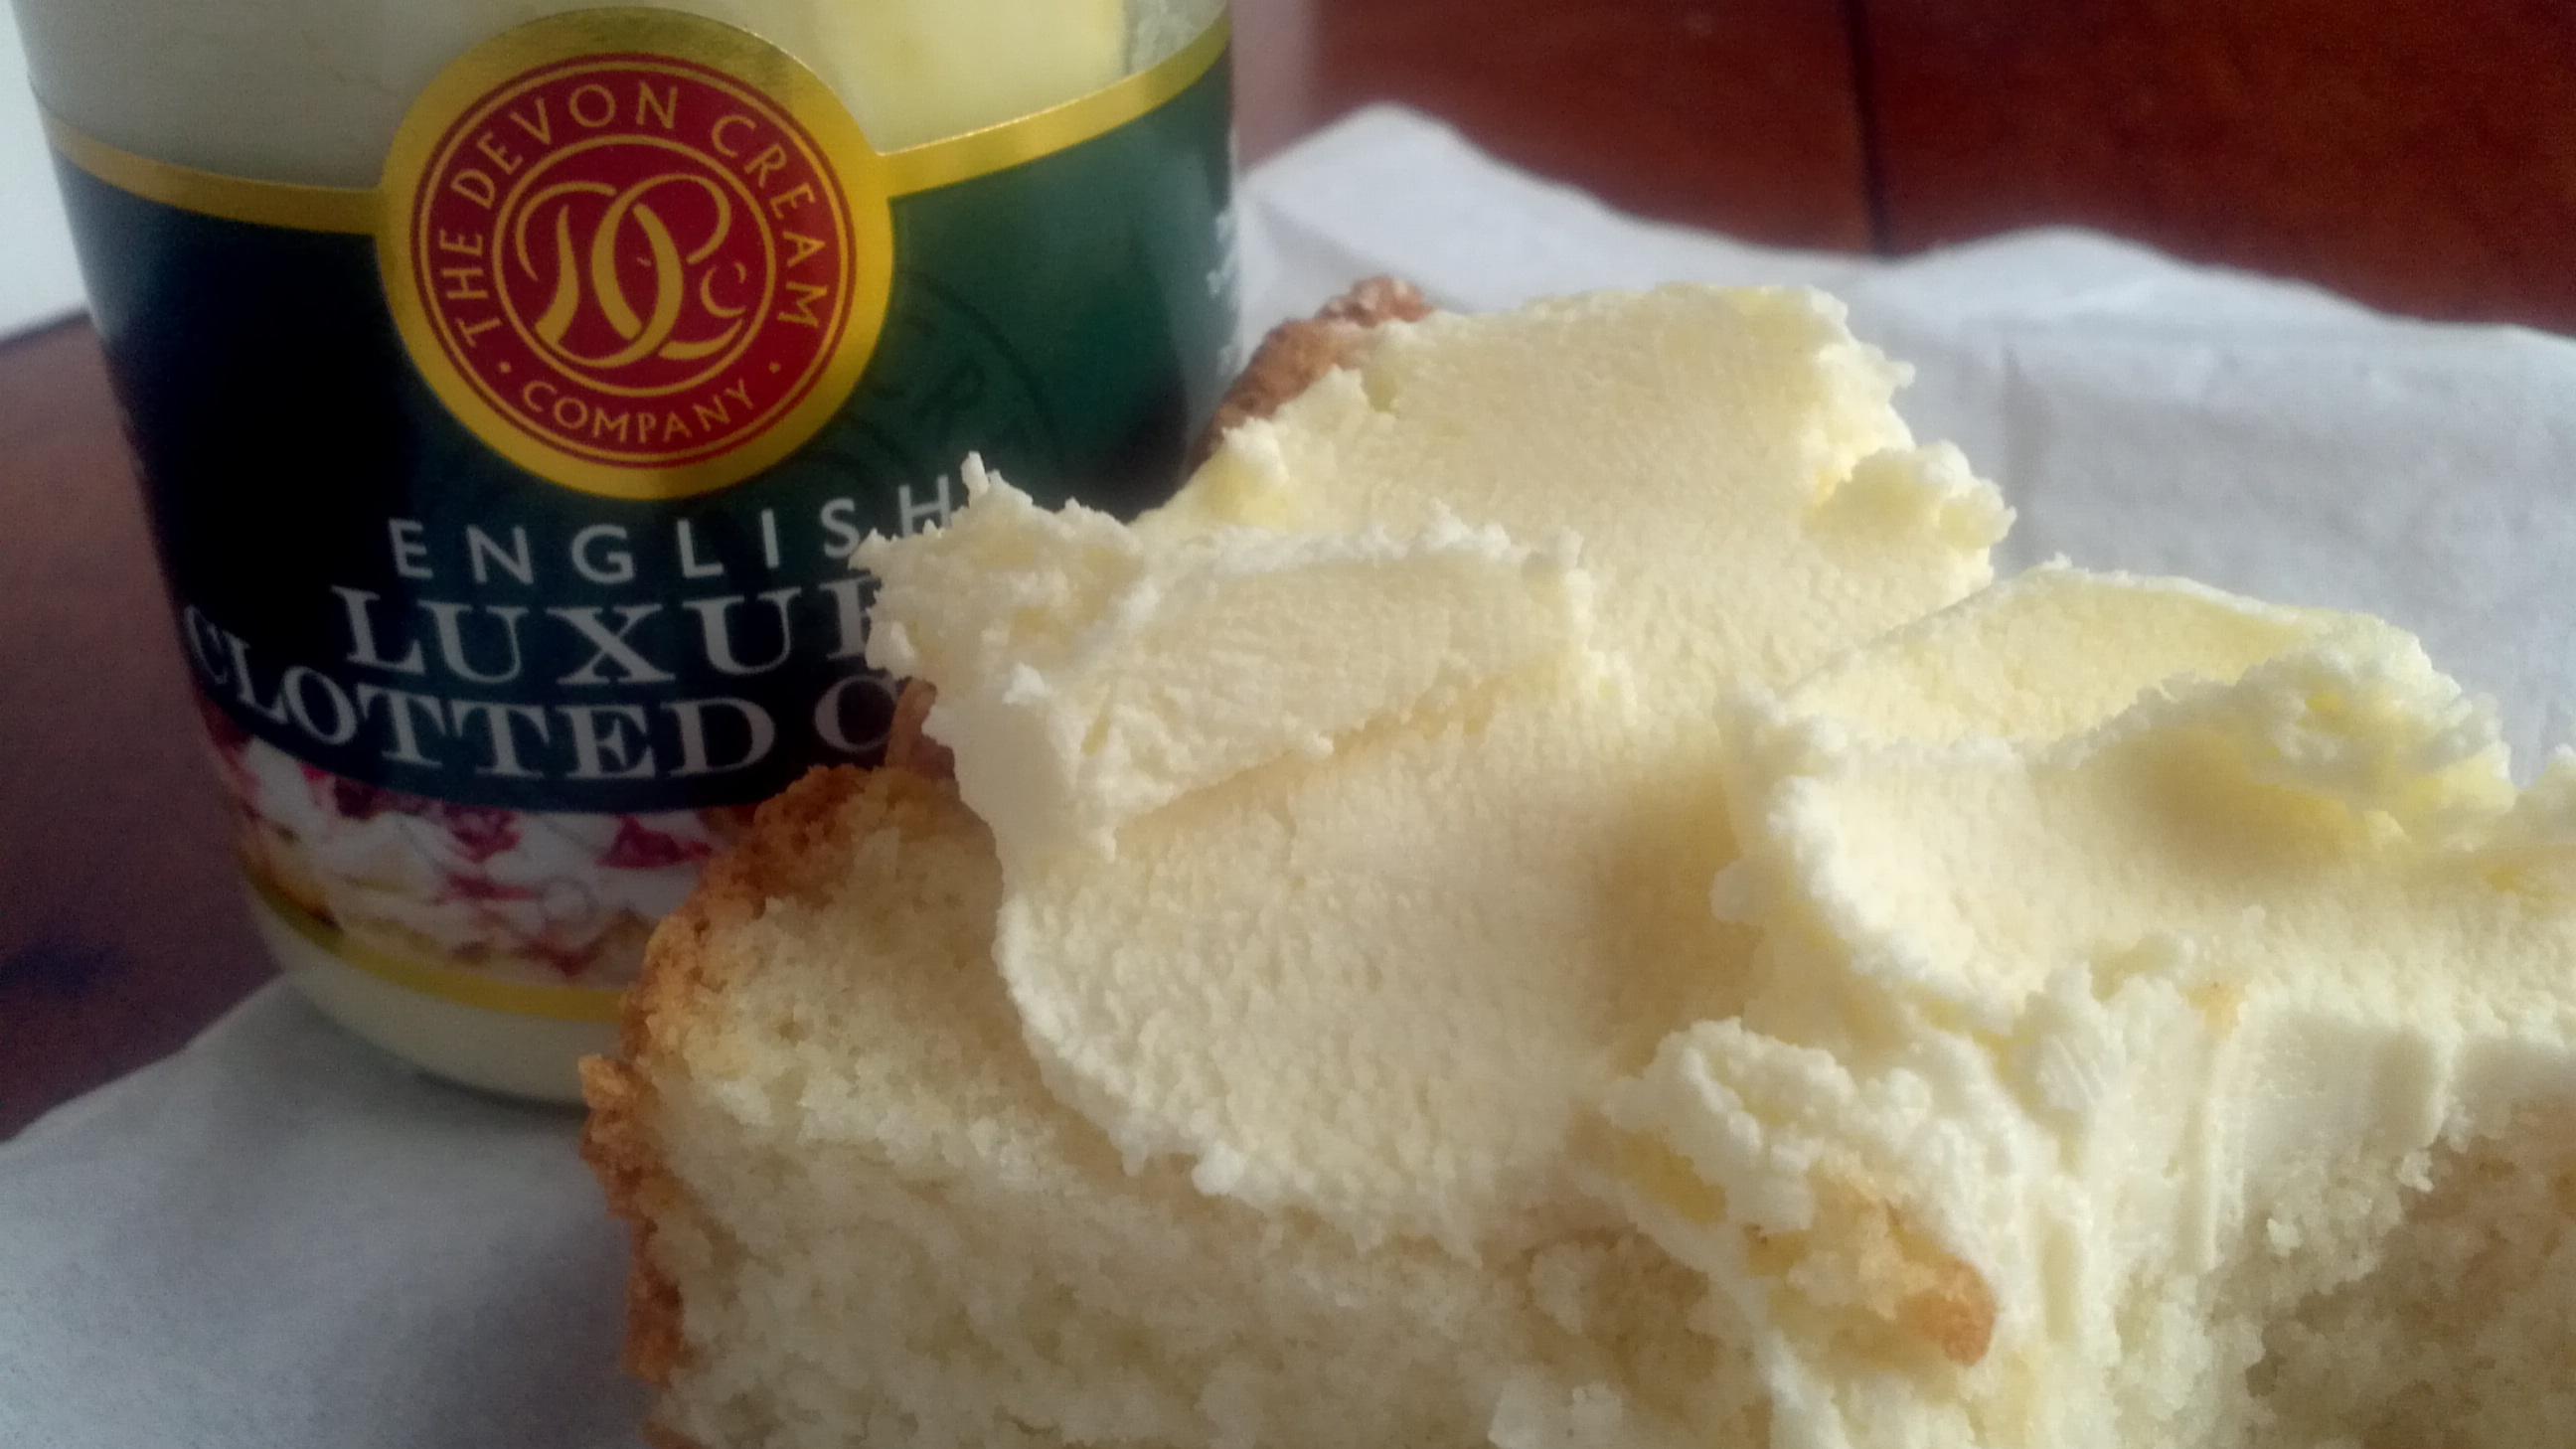 Intriguing Very Paula Deen Pound Cake C Oven Paula Deen Pound Cake Grilled Plums Clotted Cream Paula Deen Hunting nice food Paula Deen Pound Cake